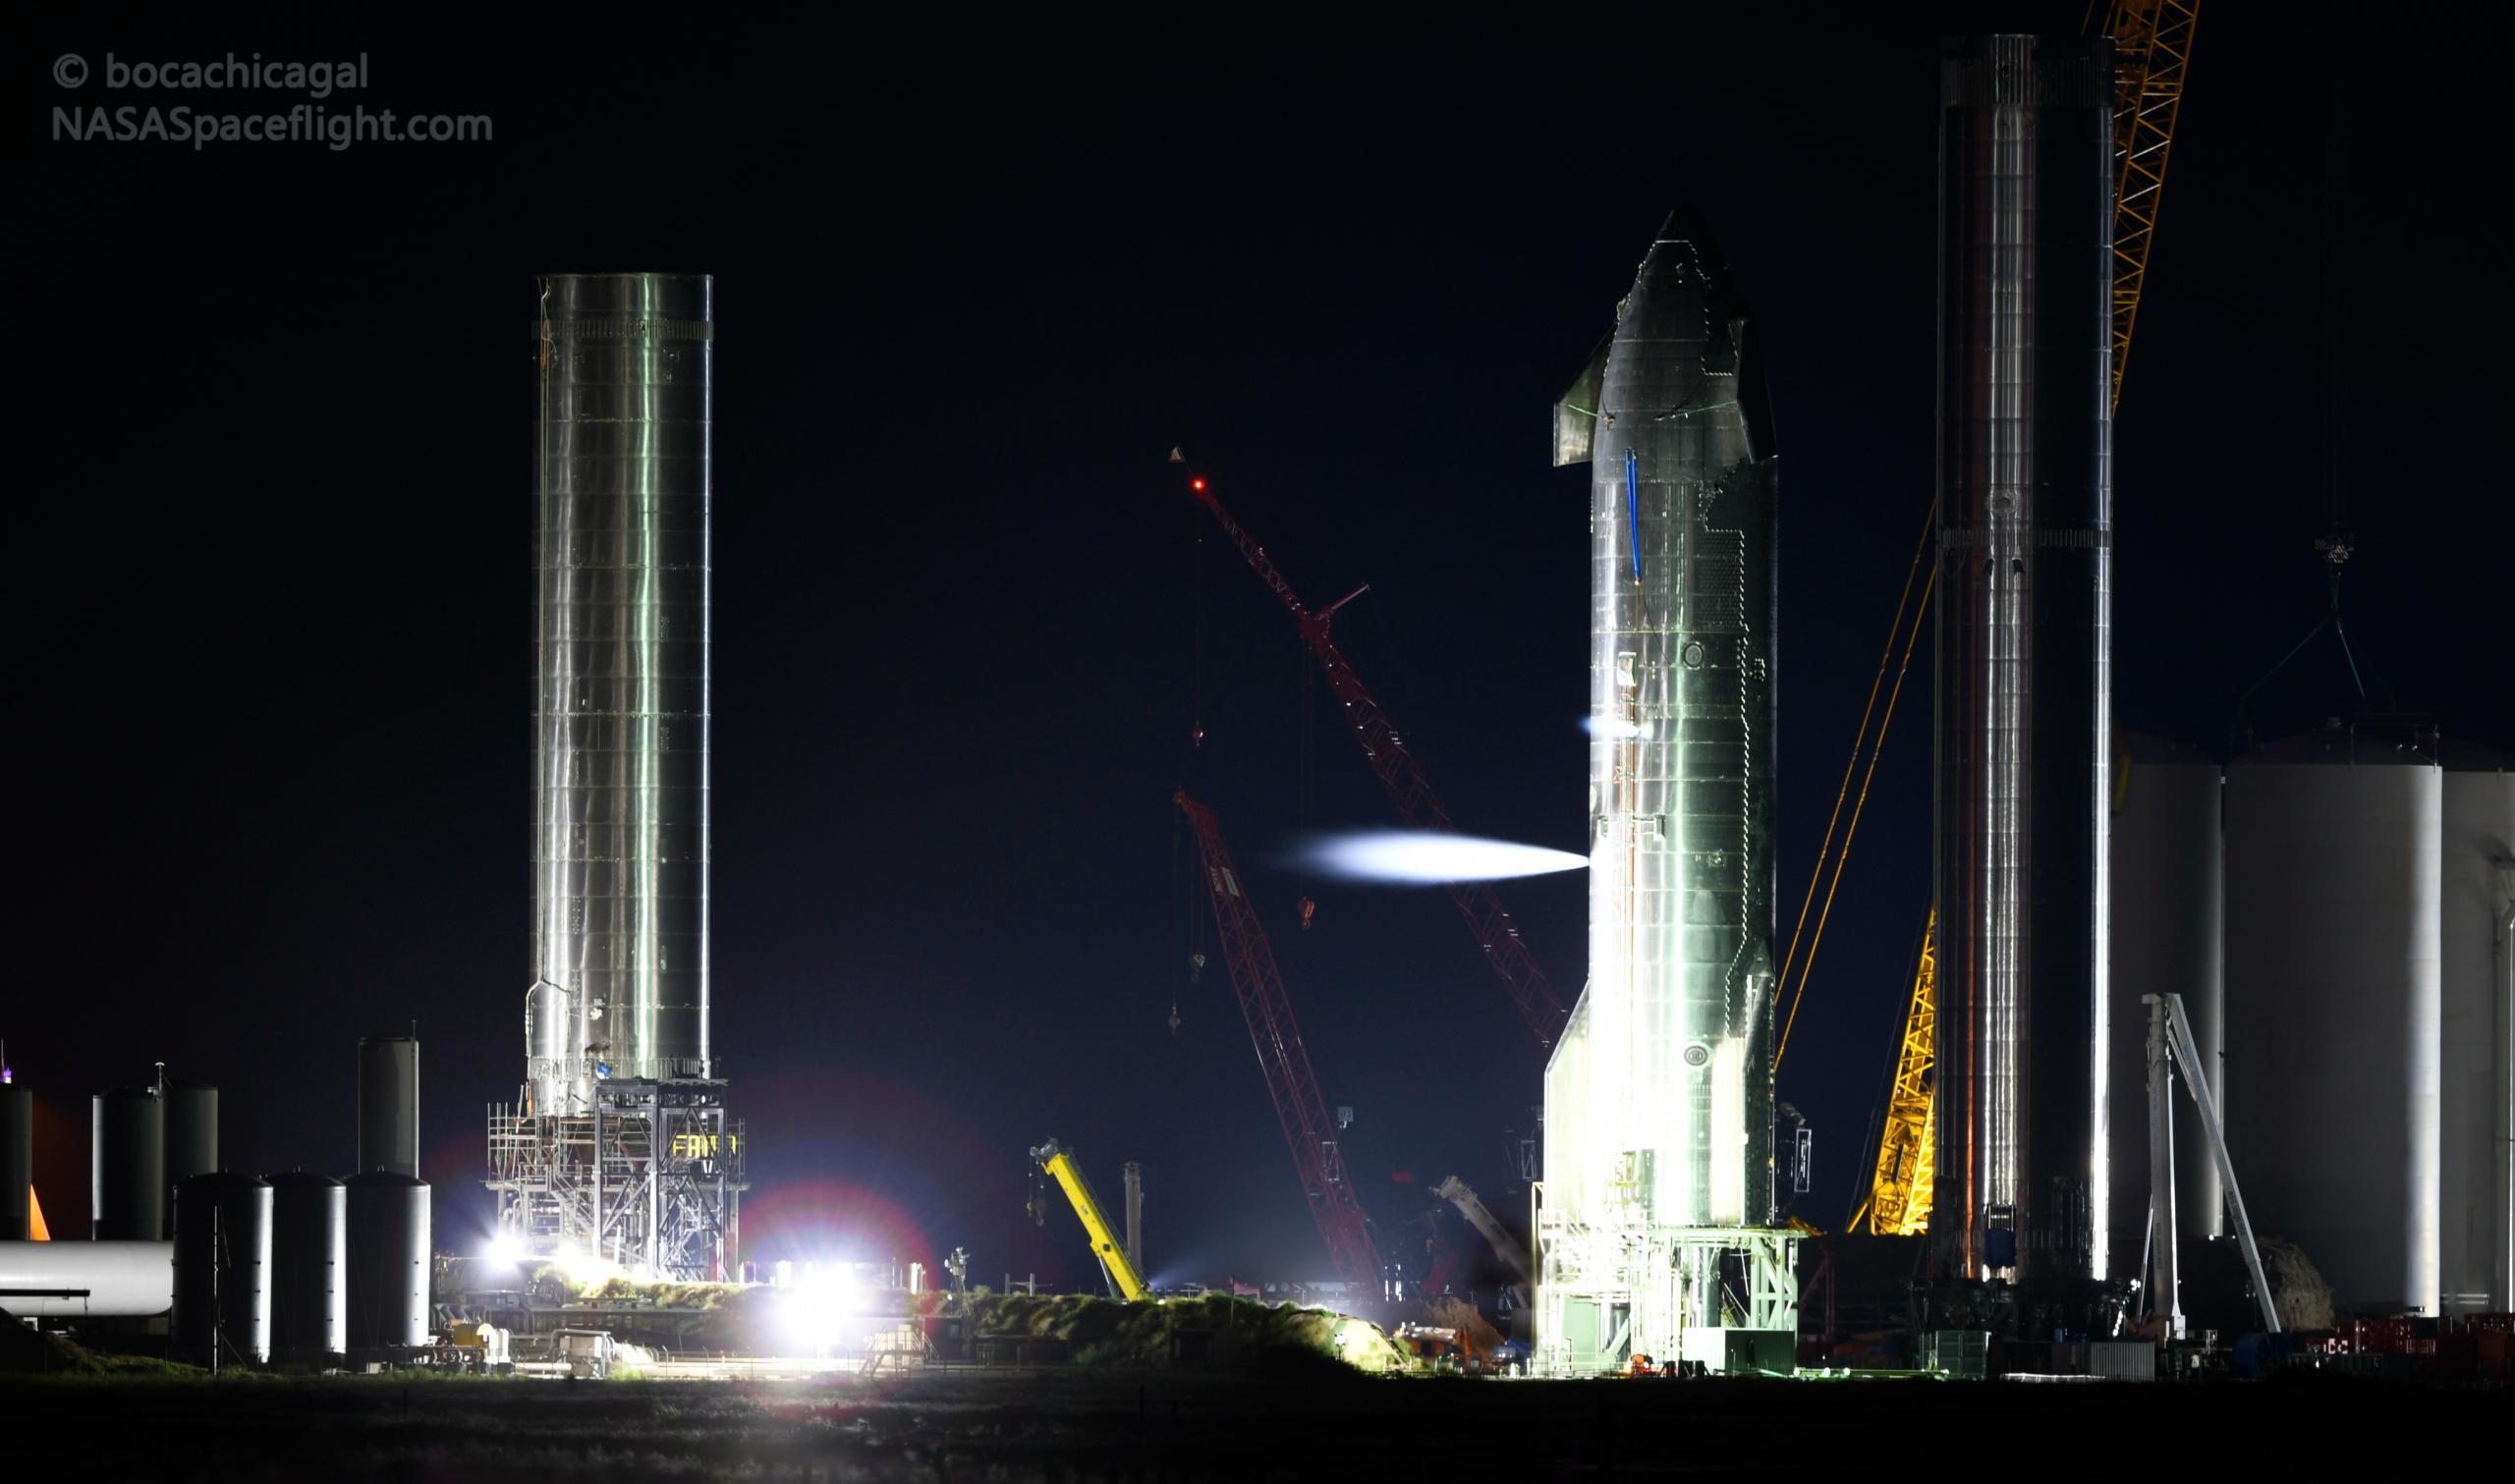 Starbase 092721 (NASASpaceflight – bocachicagal) S20 testing + B4 B3 + vent 1 crop (c)